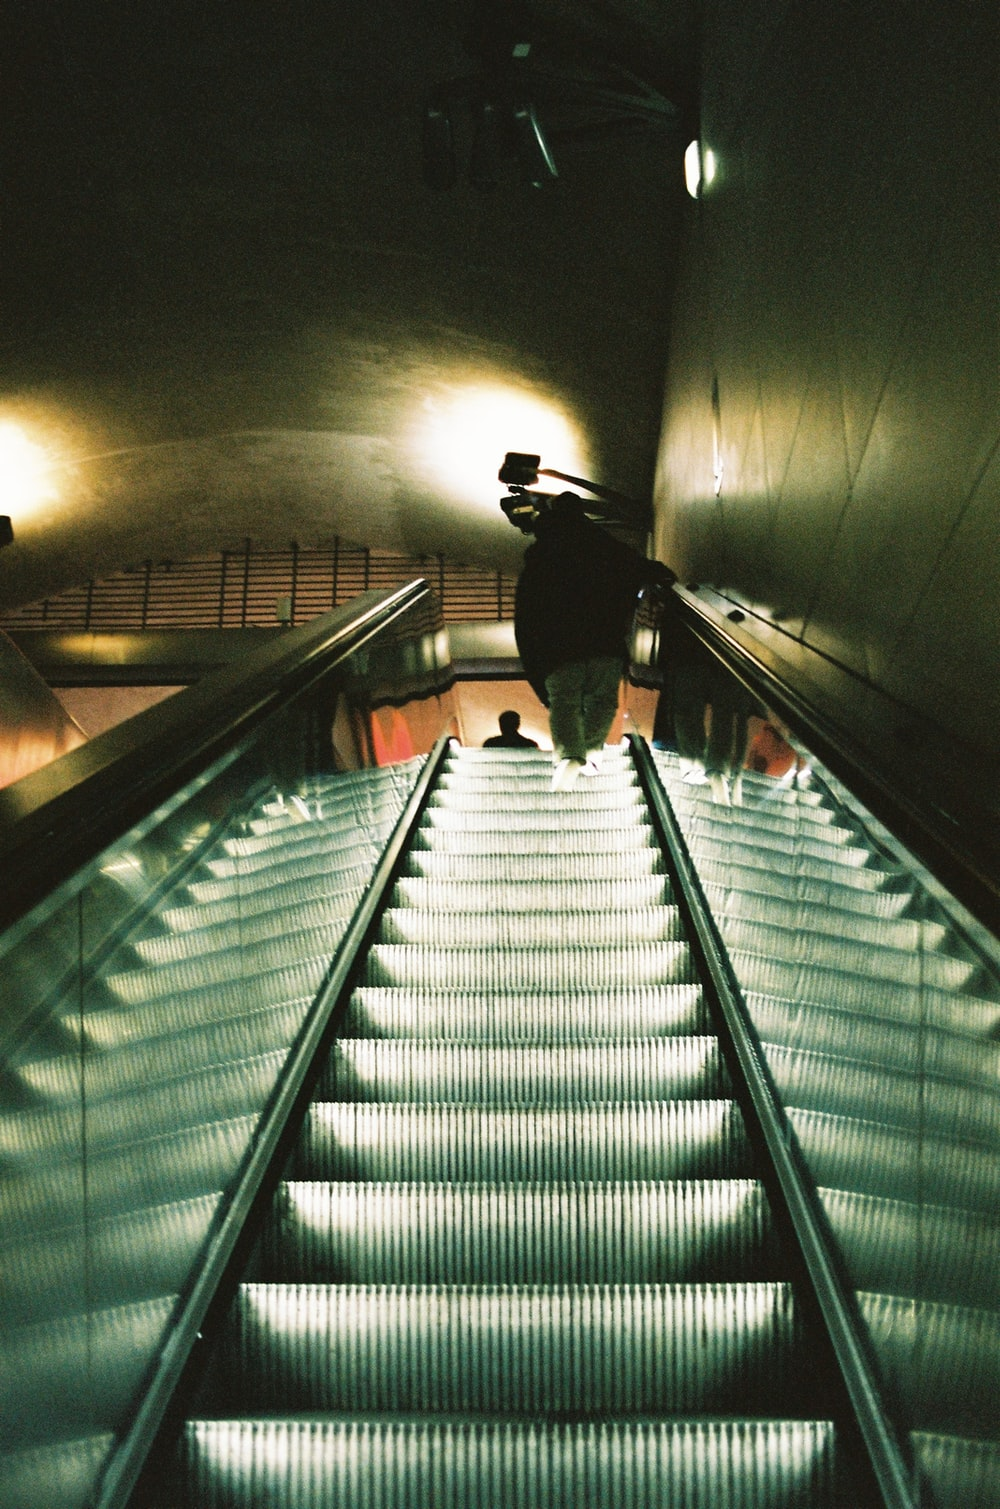 man in black jacket walking on gray staircase